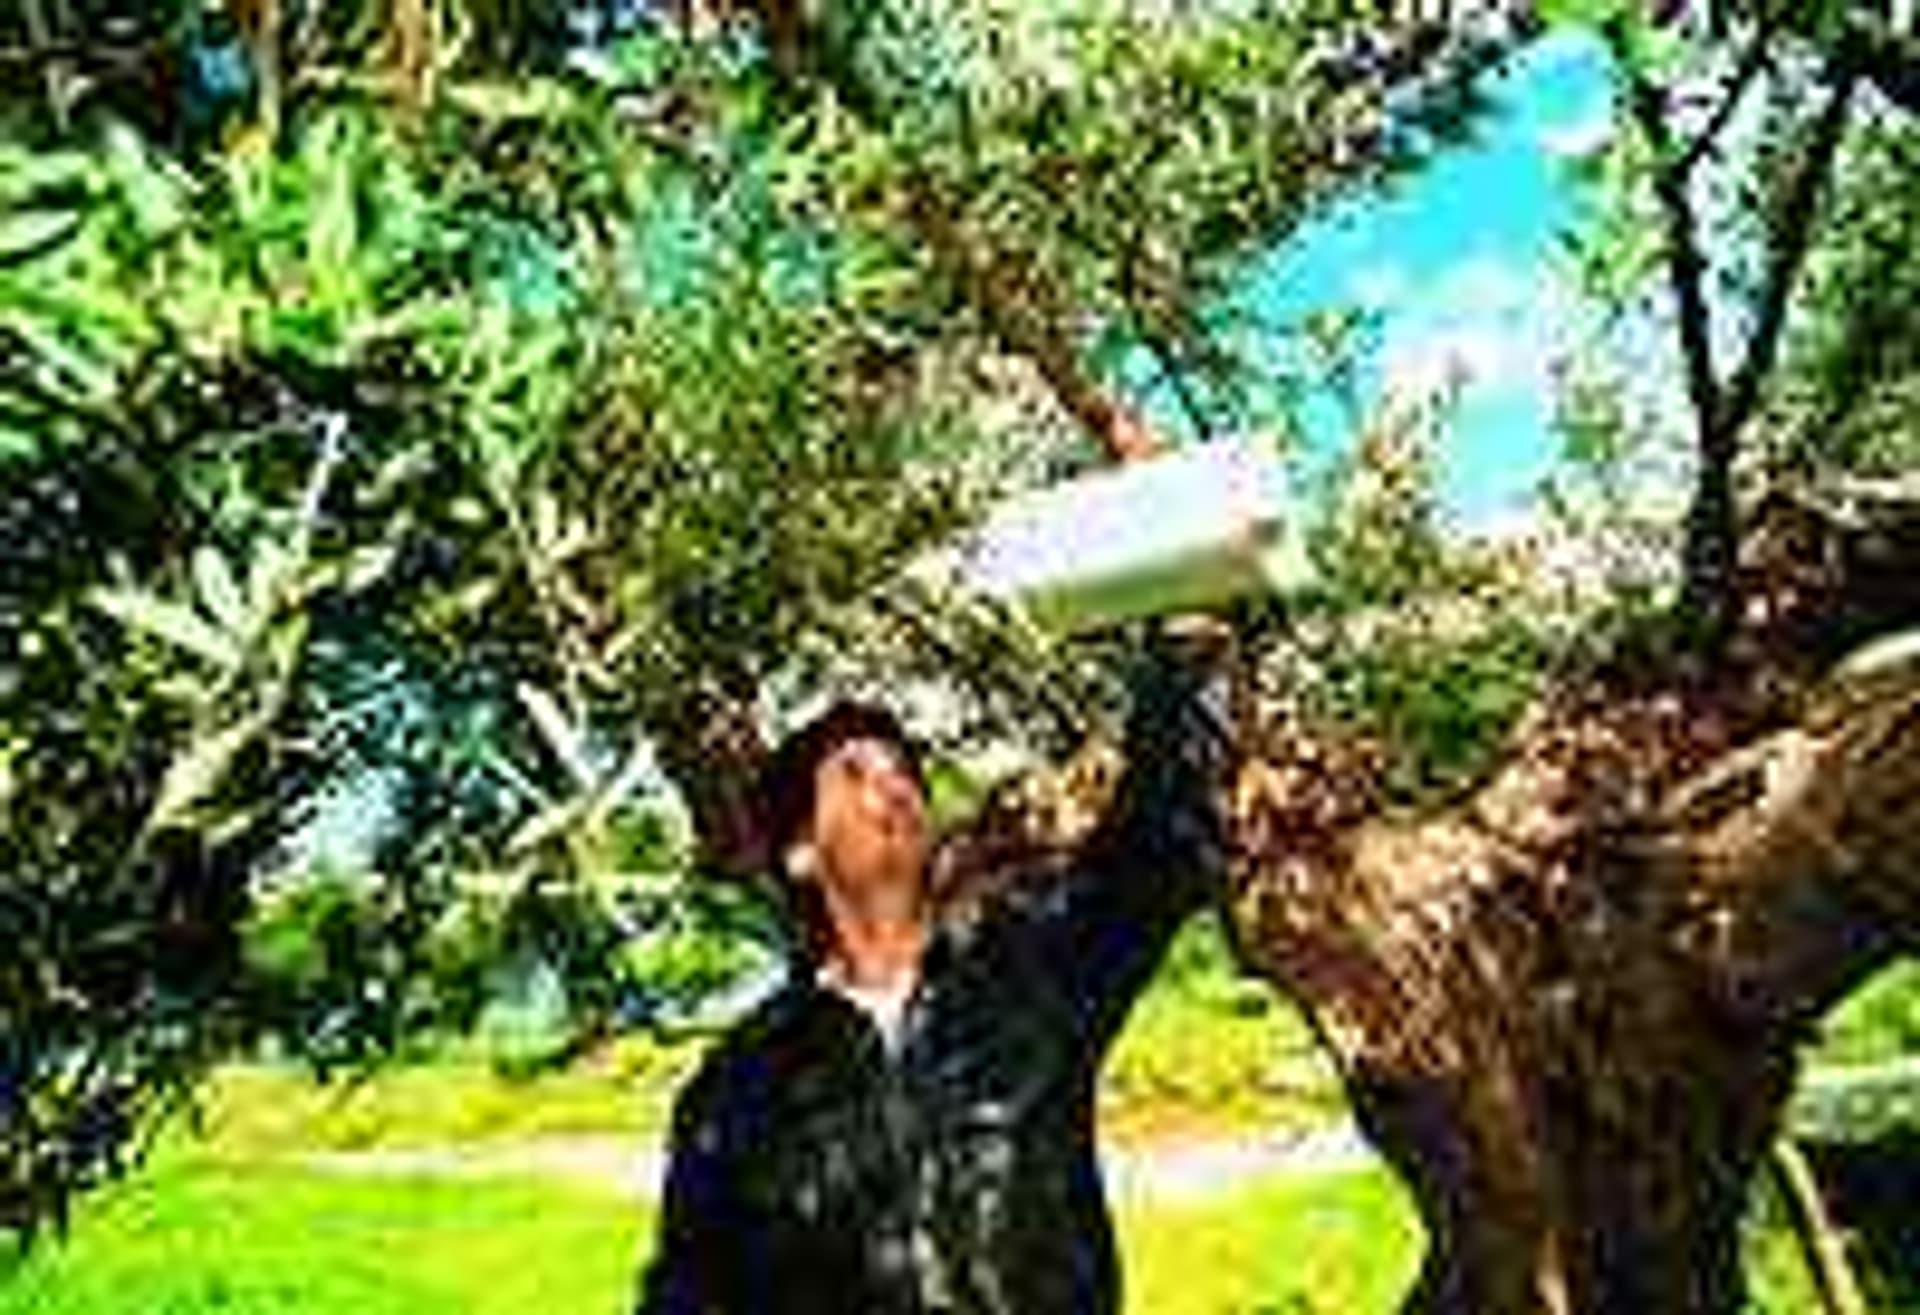 Glosse mannolivenbaum